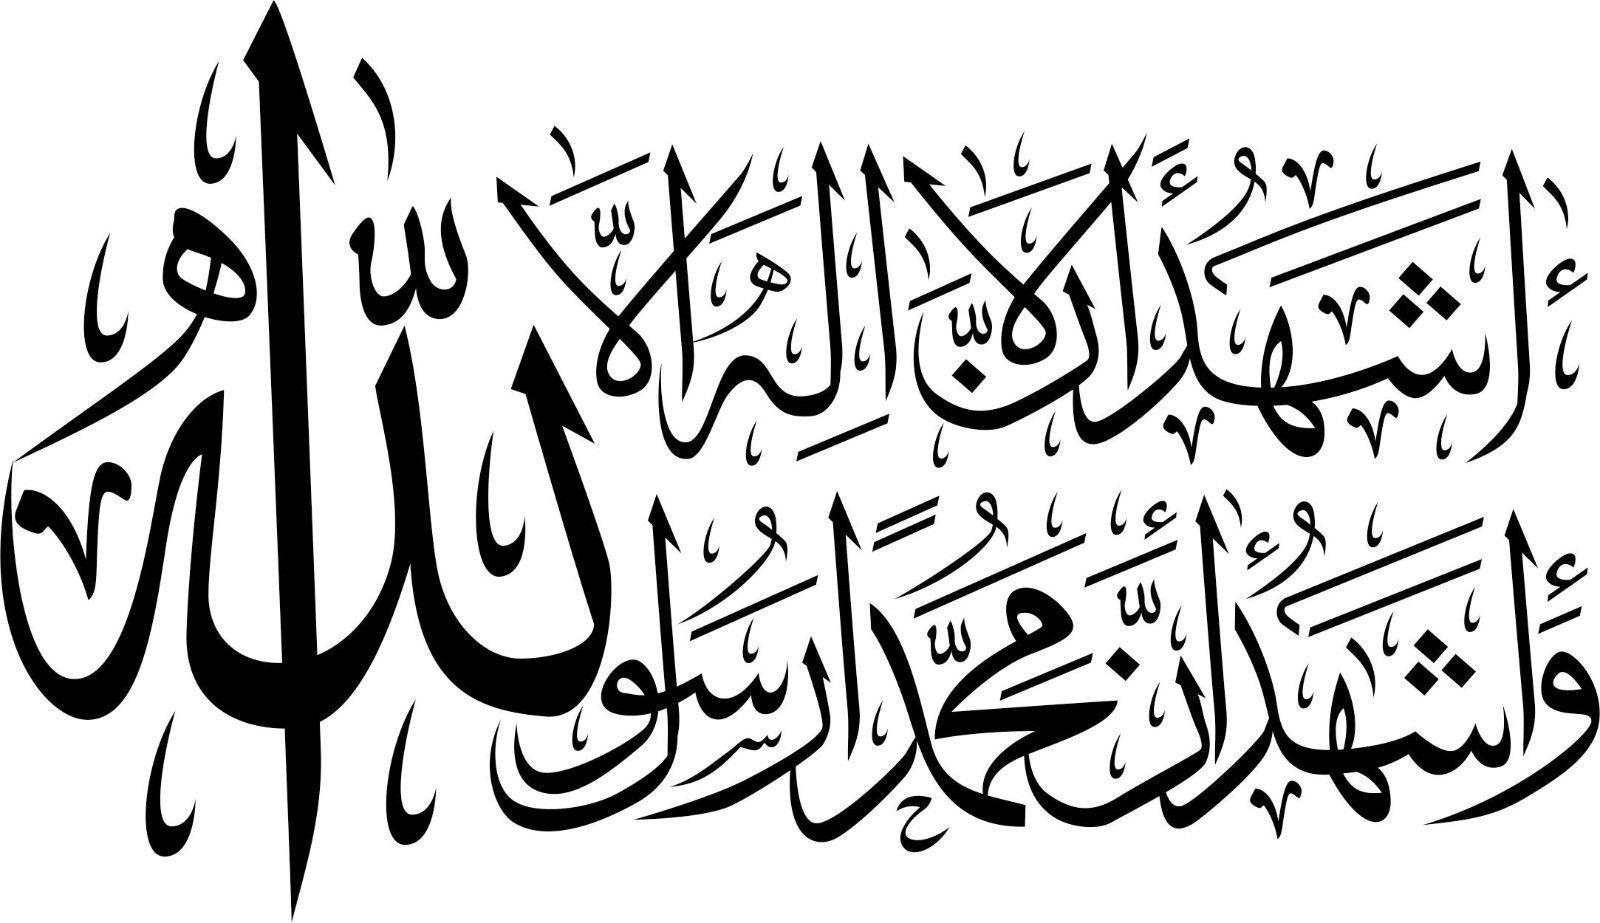 Sticker Art Islamic Decal Wall Calligraphy Vinyl Allah Arabic Ramadan Kareem Islamic Art Calligraphy Sticker Art Arabic Calligraphy Design